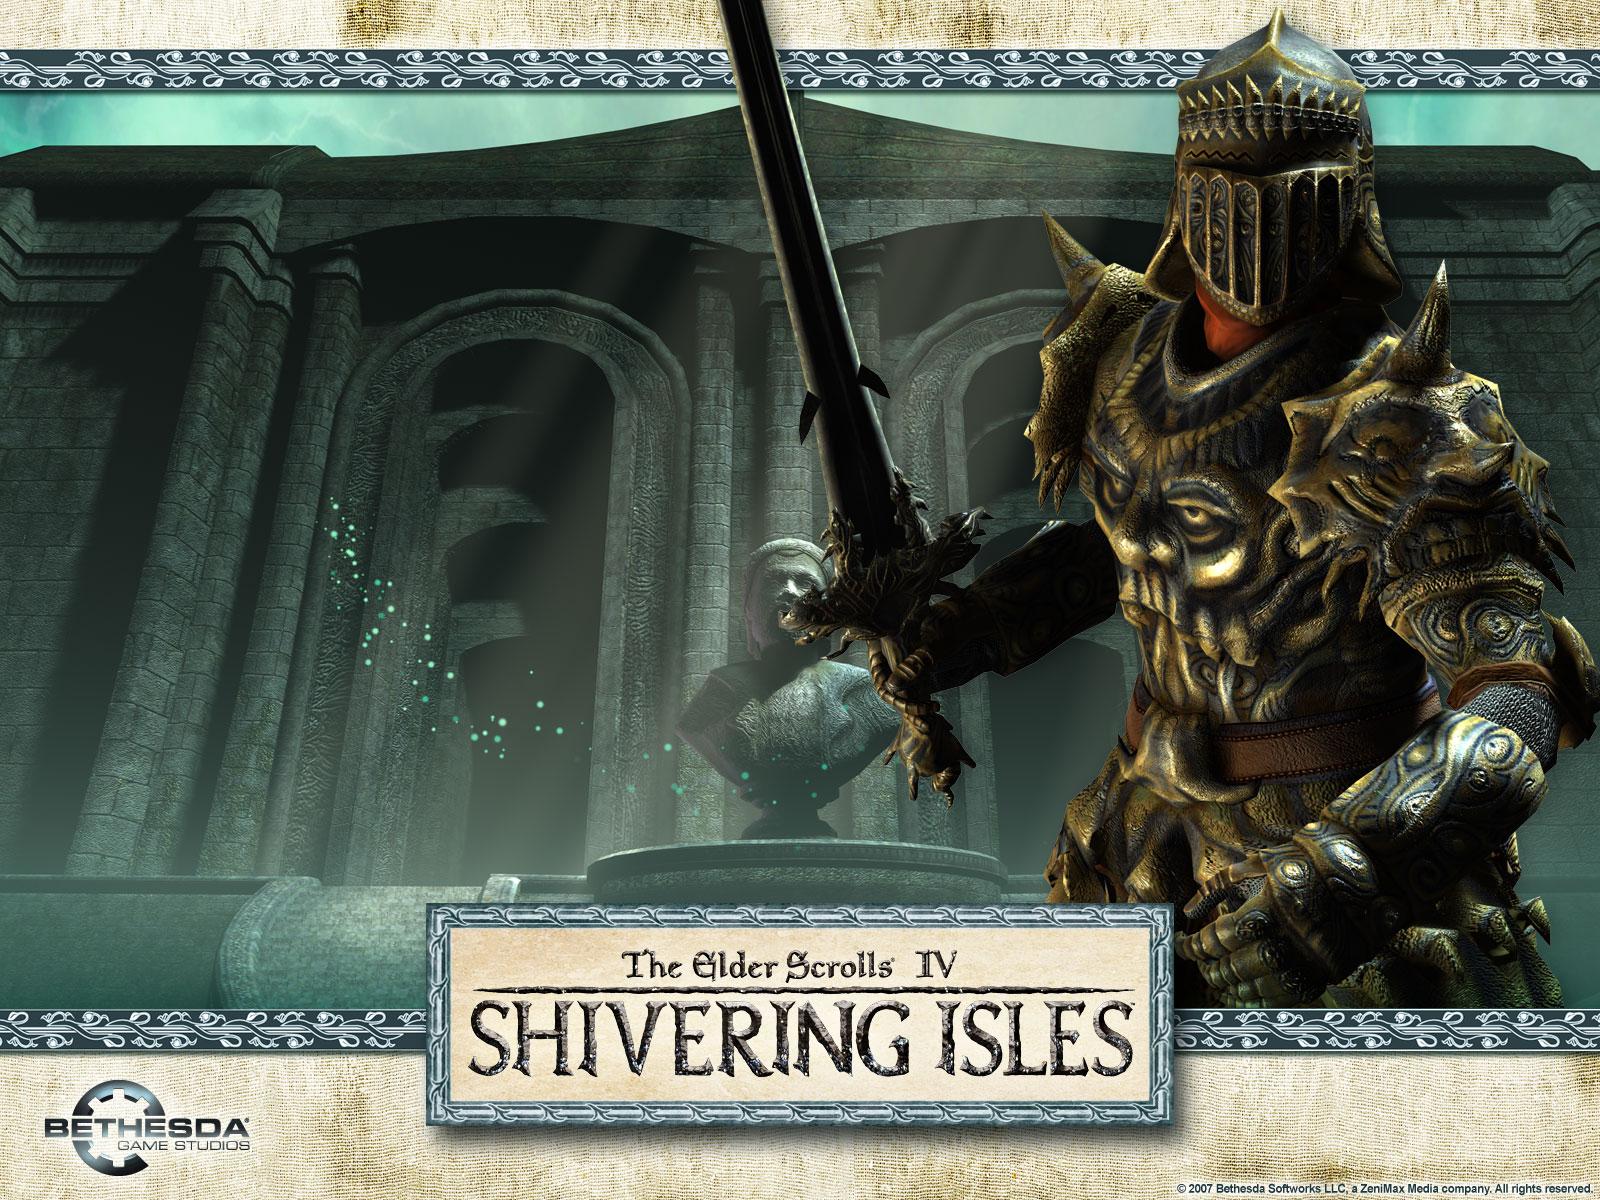 Category Shivering Isles Armor Elder Scrolls Fandom